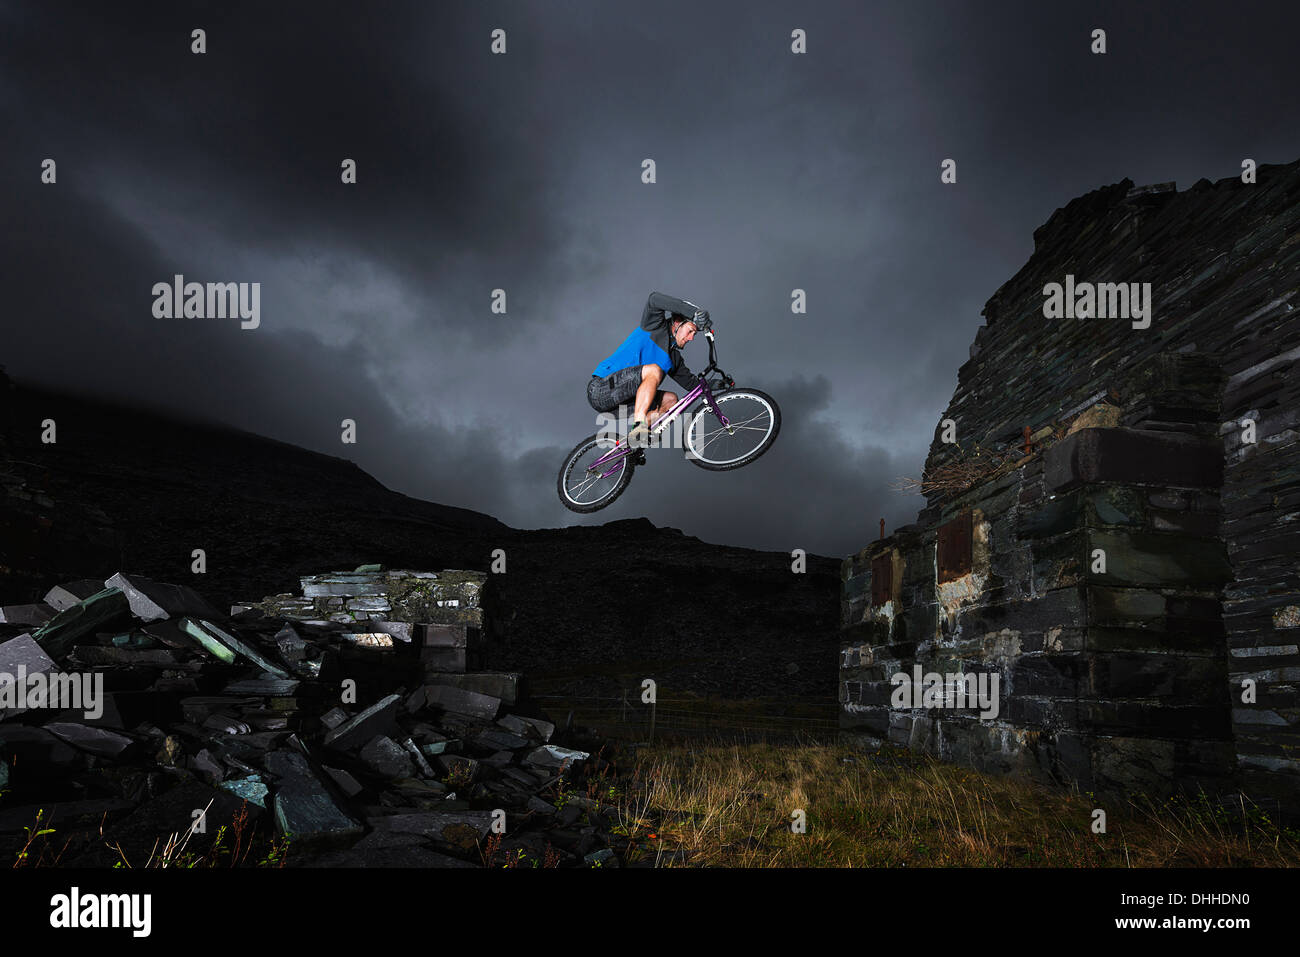 Freestyle cycling, Llanberis, North Wales, UK - Stock Image